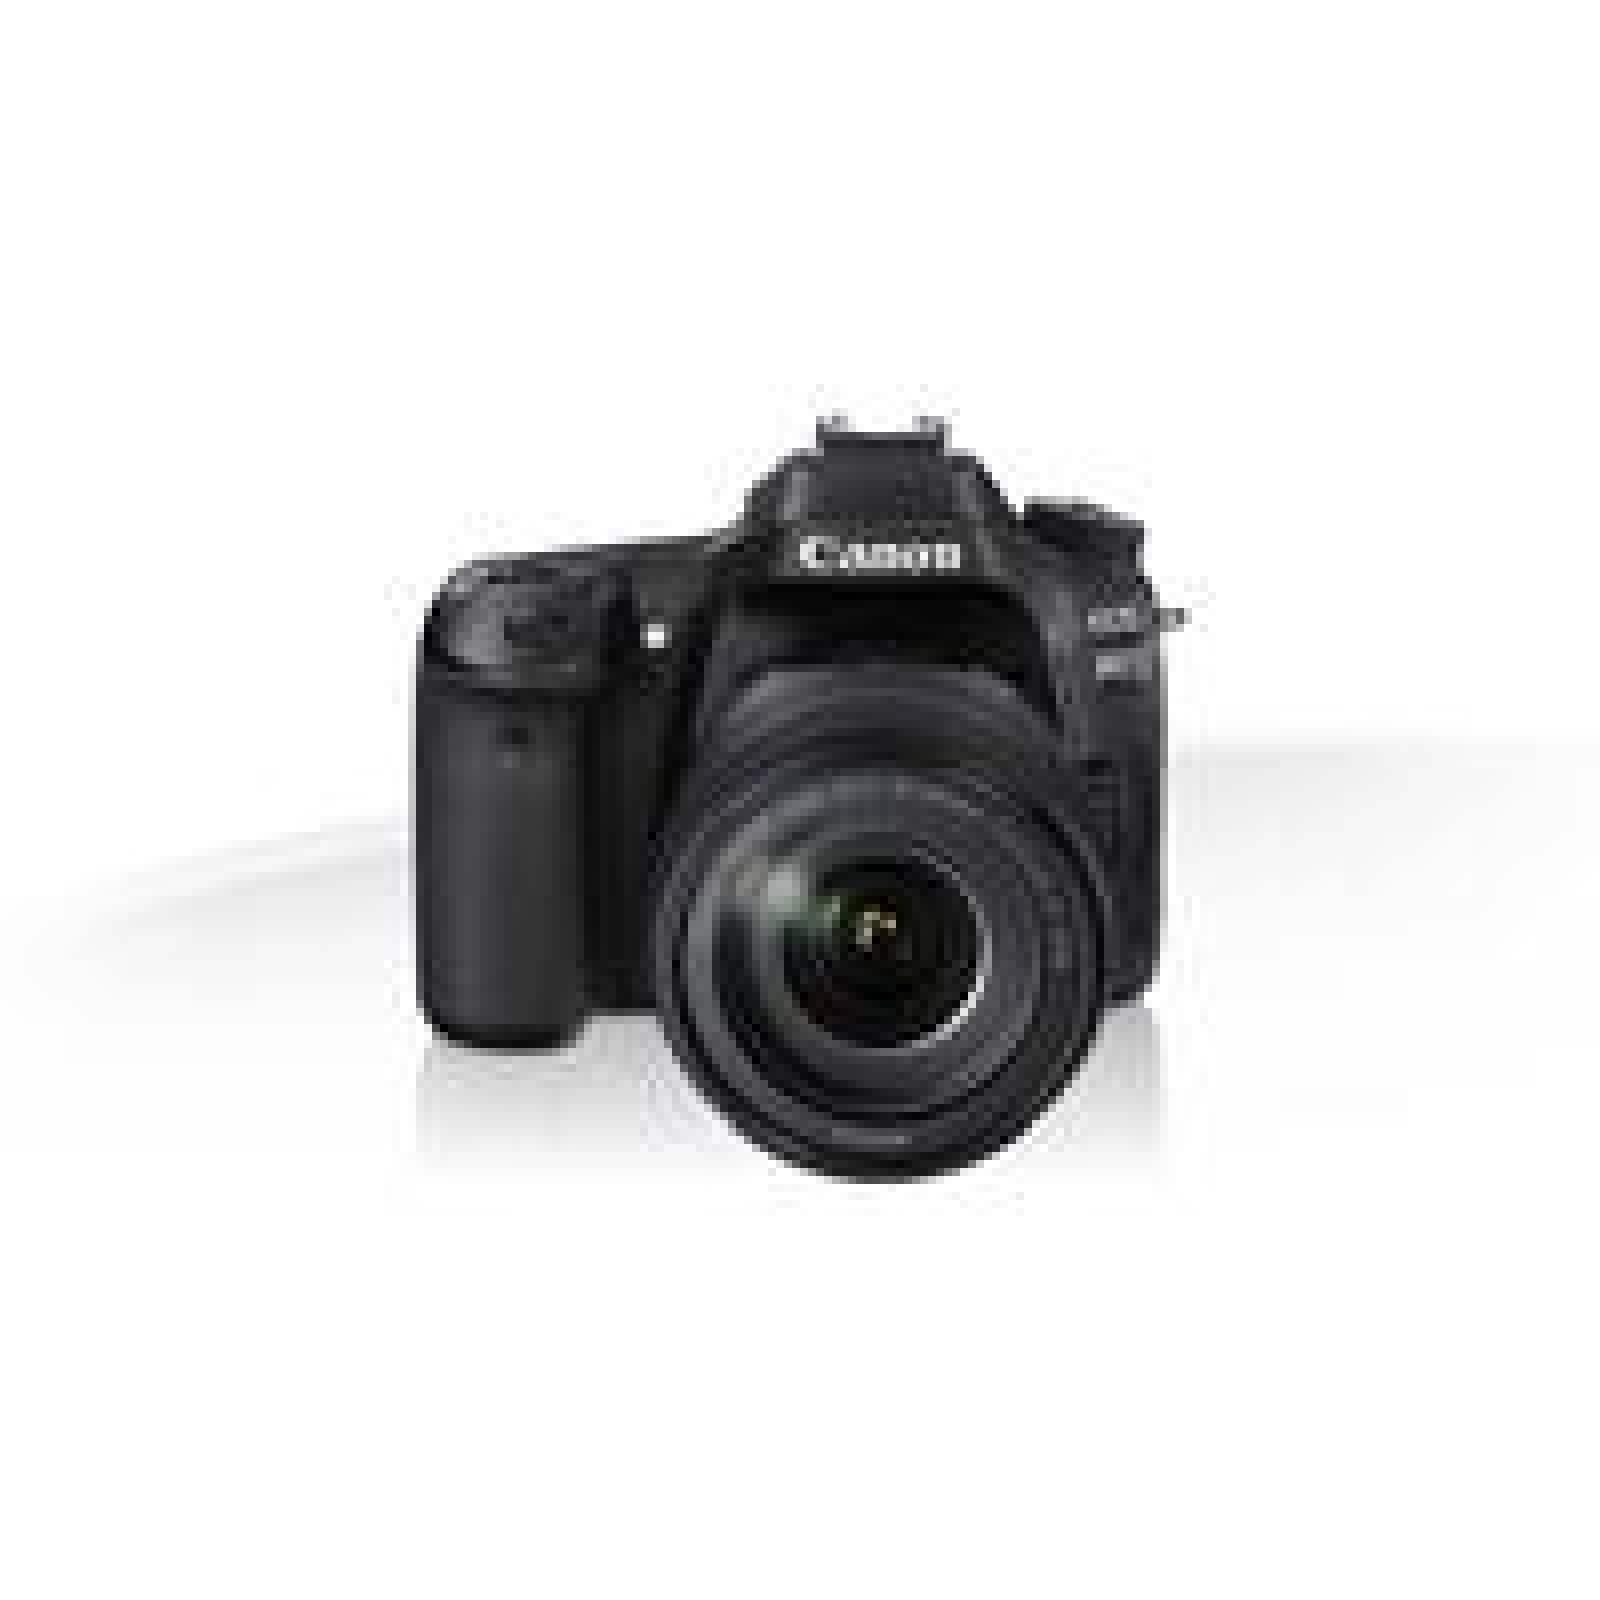 CAMARA CANON EOS REFLEX 80D 24.2 MP LCD 3.0 WIFI NFC LENTE EF 18-135 MM IS V. FULL HD